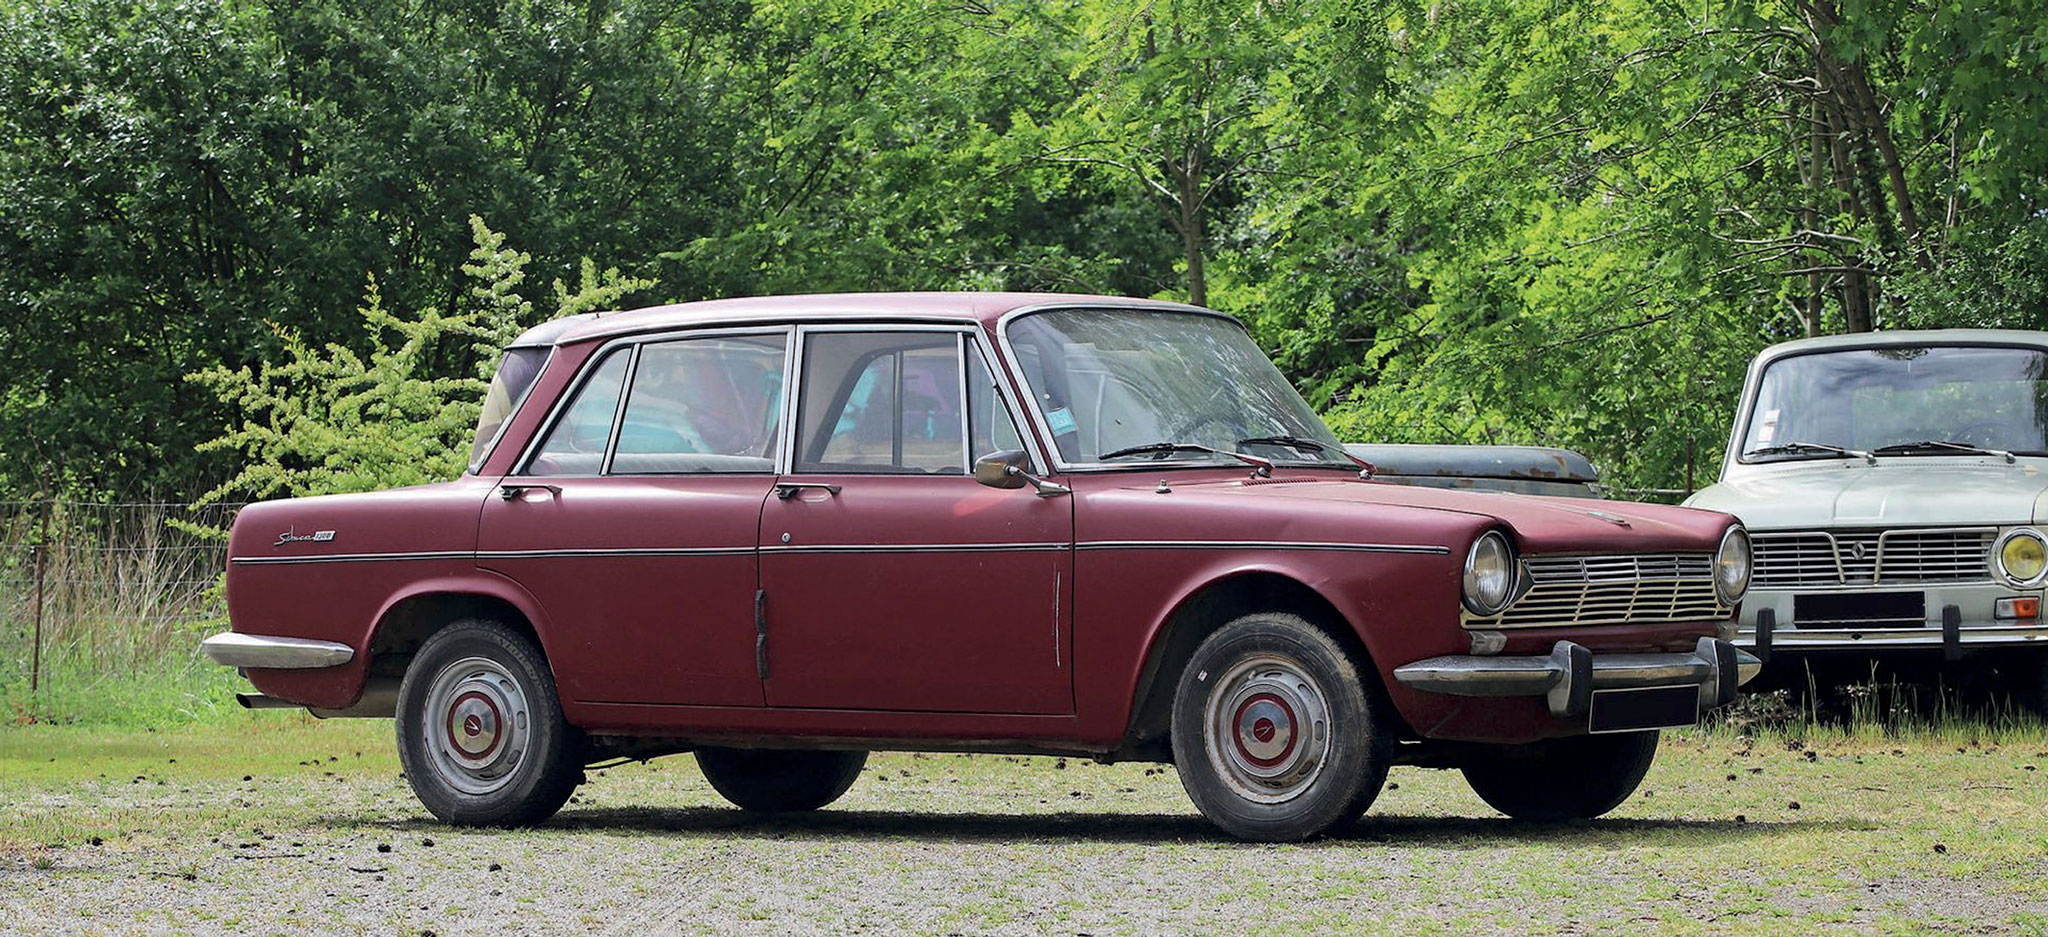 1964 Simca 1300 €800 - 1200 - Populaires Françaises.